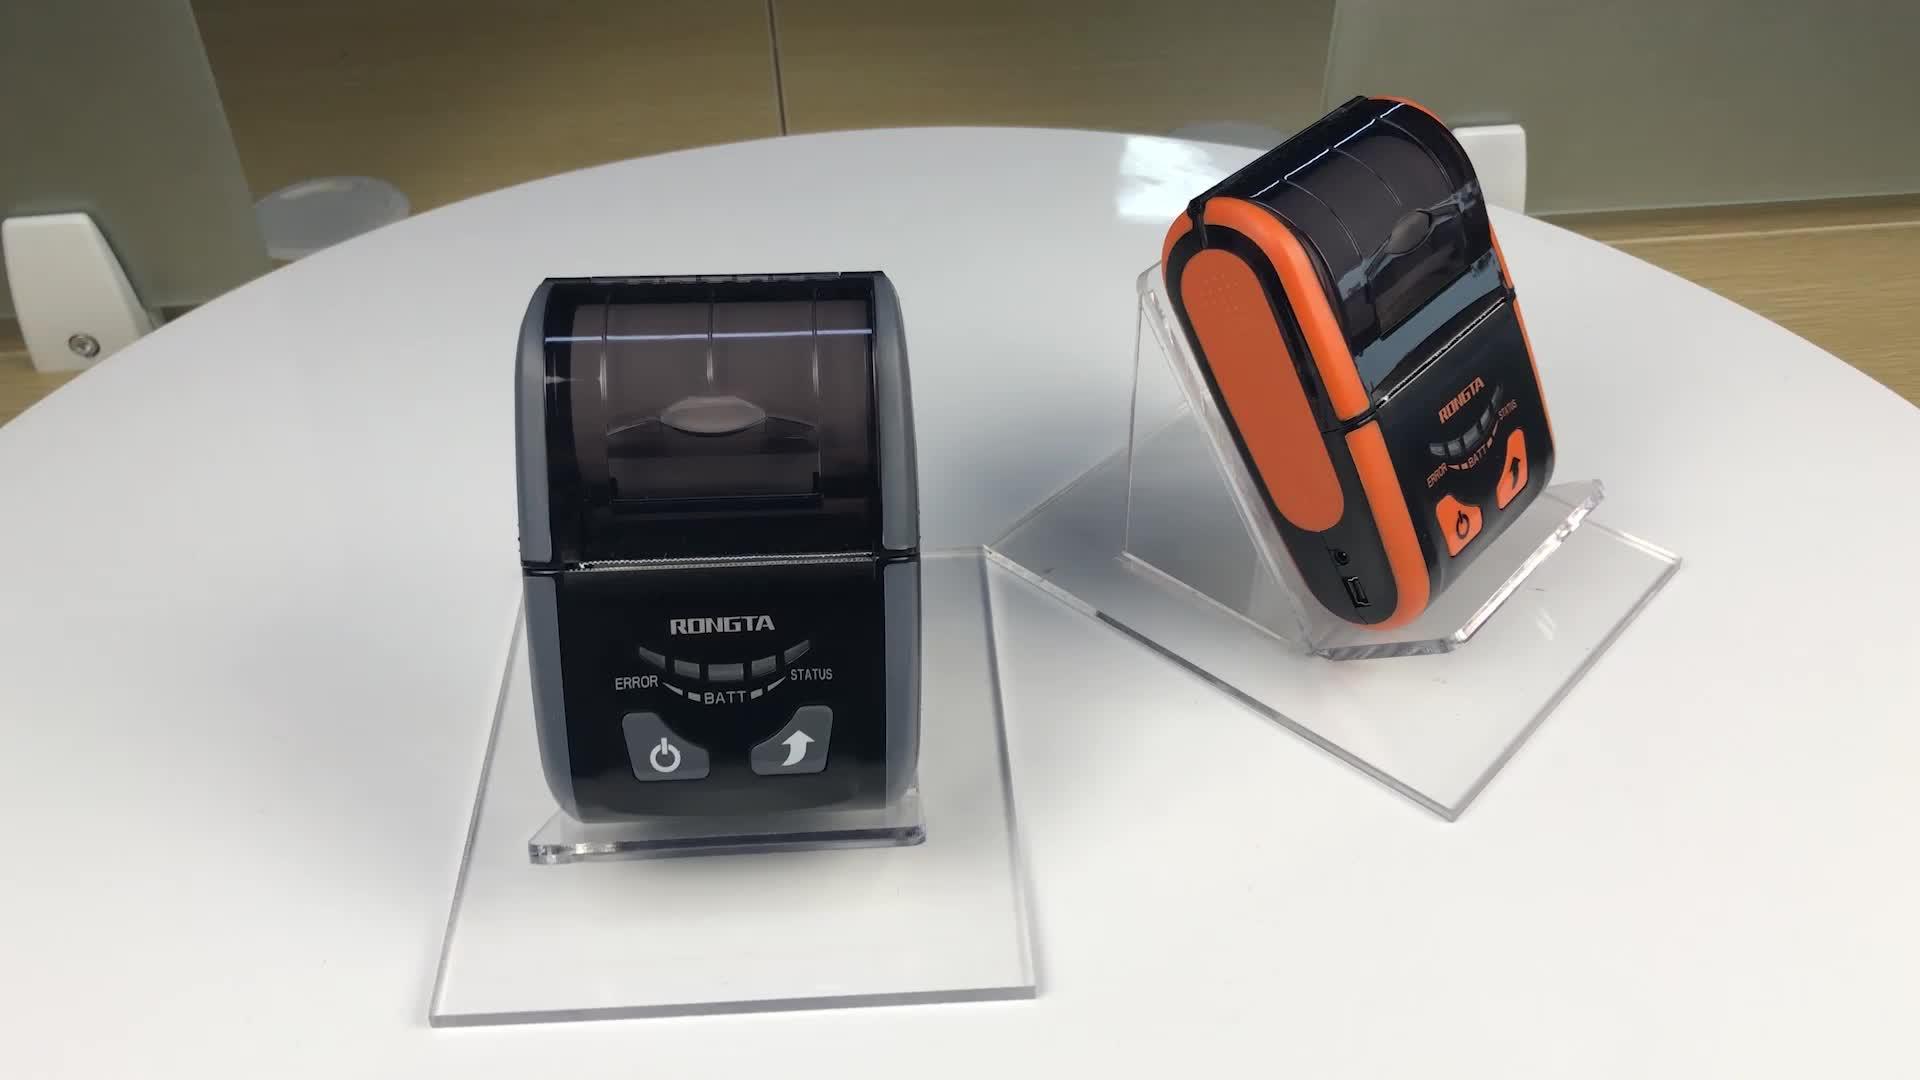 58mm มินิแบบพกพาเครื่องพิมพ์ความร้อน USB Bluetooth WIFI